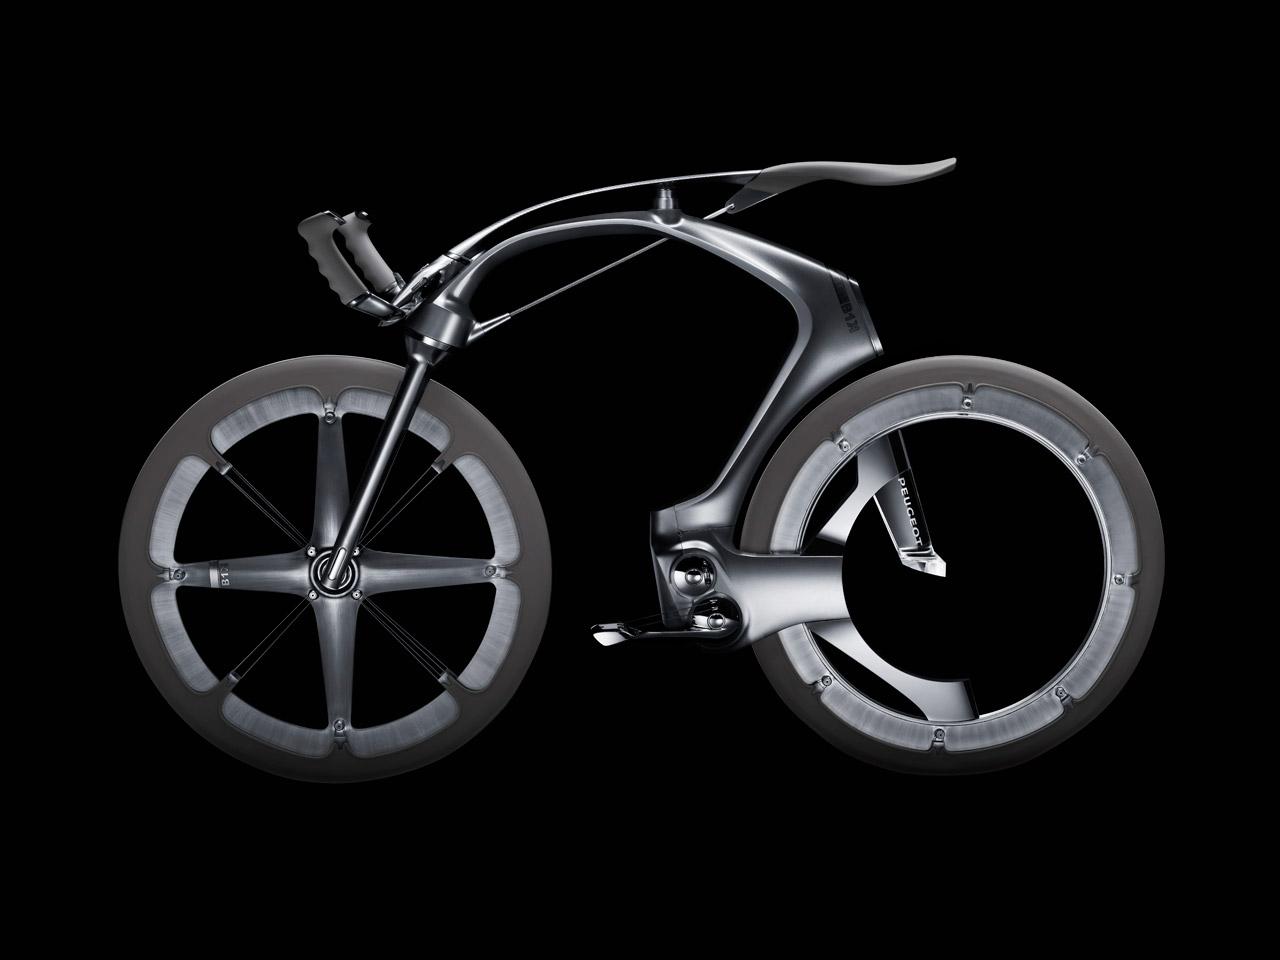 https://i0.wp.com/www.carbodydesign.com/archive/2010/02/peugeot-b1k-bike-concept/_Peugeot-B1K-Bike-Concept-1-lg.jpg